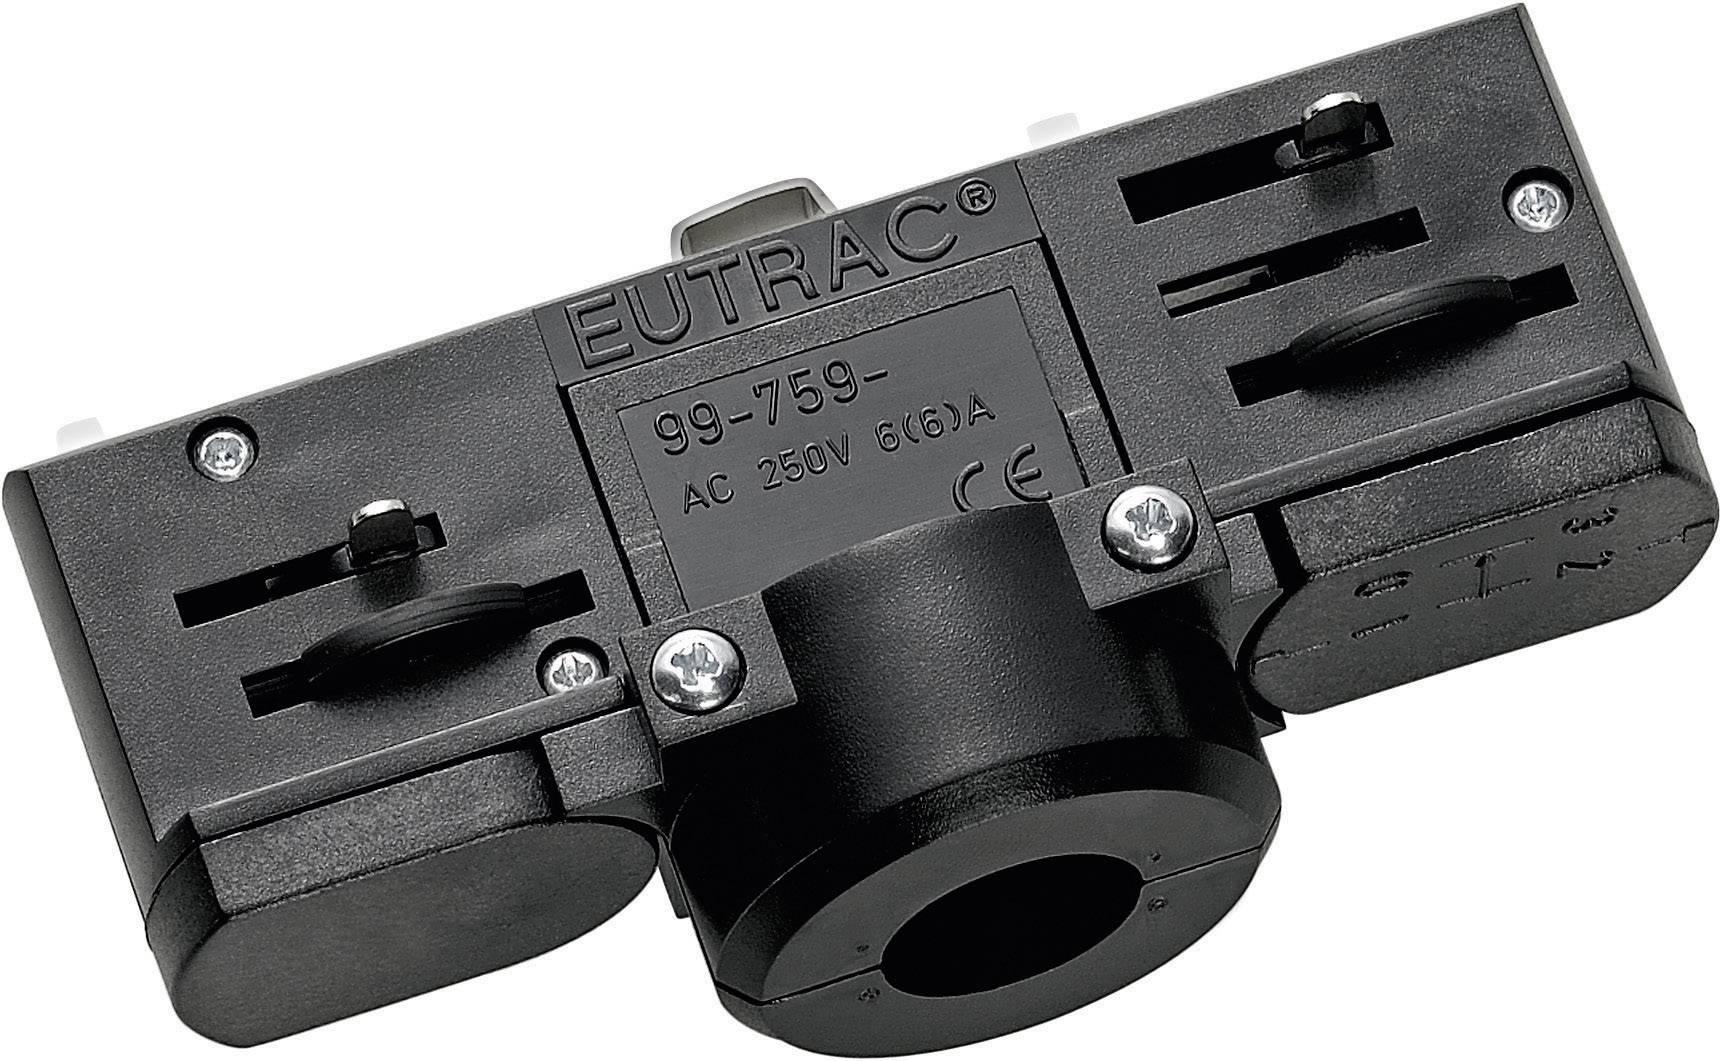 Adaptér lišty - vysokonapěť. komponent lištových systémů Eutrac 145994, stříbrnošedá